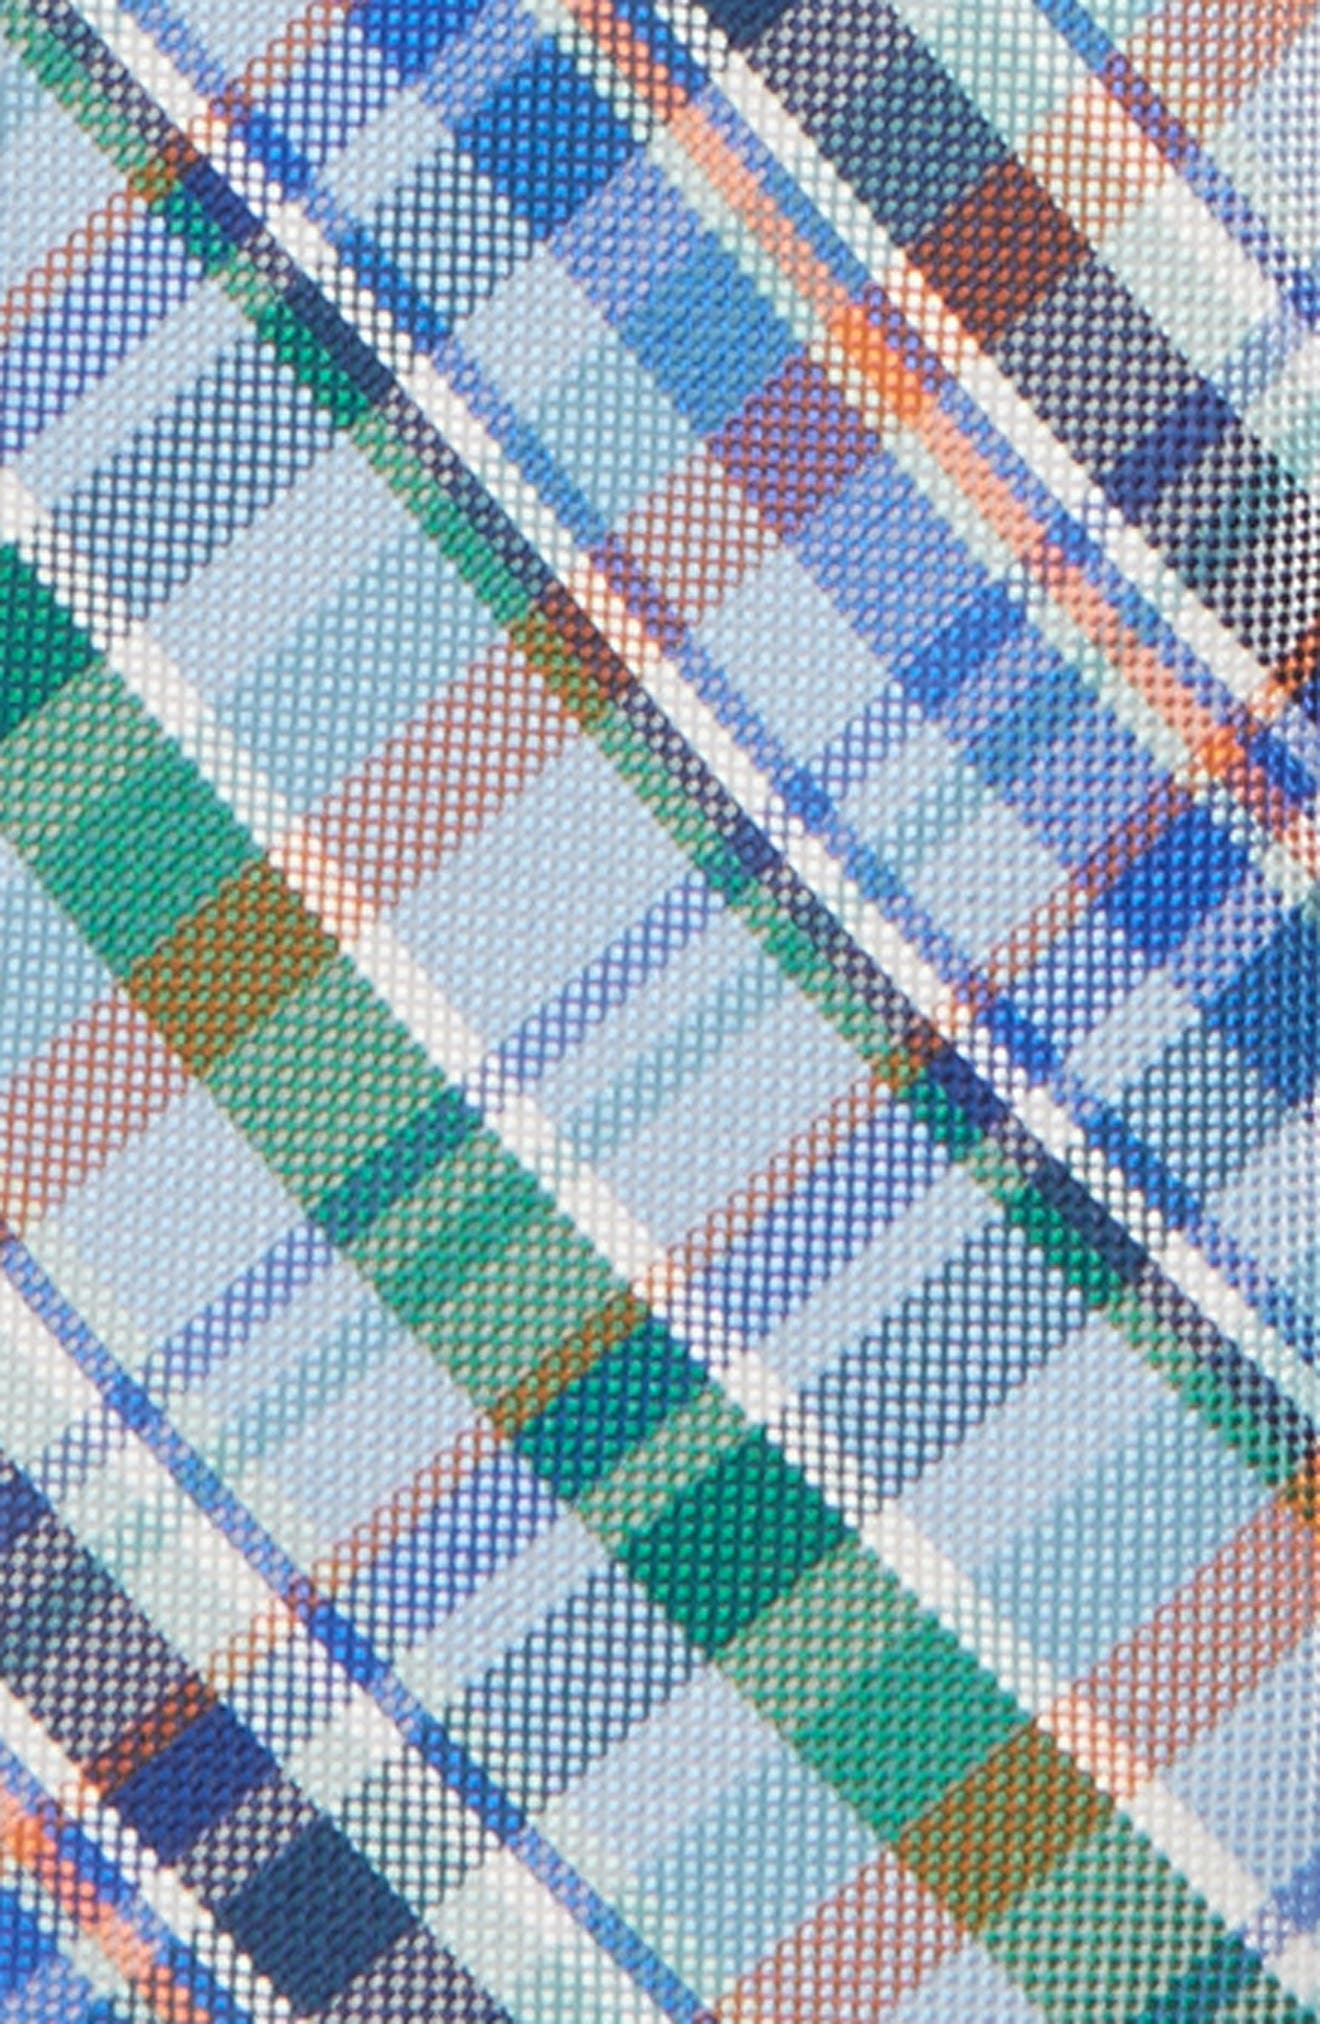 Campbell Plaid Silk Zip Tie,                             Alternate thumbnail 2, color,                             Navy